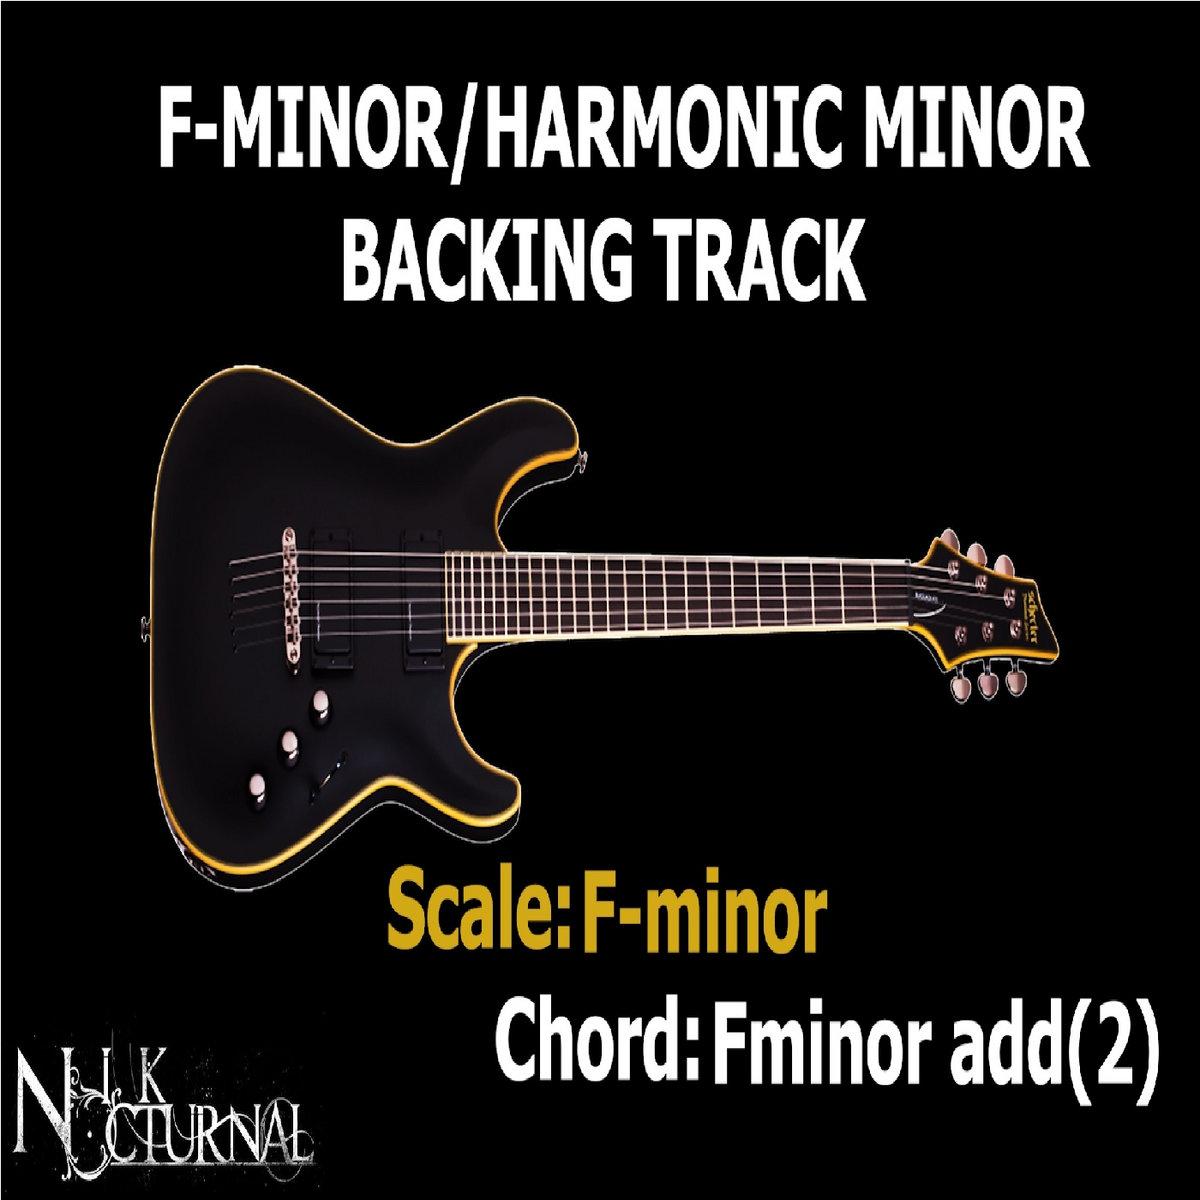 F Minorharmonic Minor Backing Track Melodic Metaljazz 105 Bpm